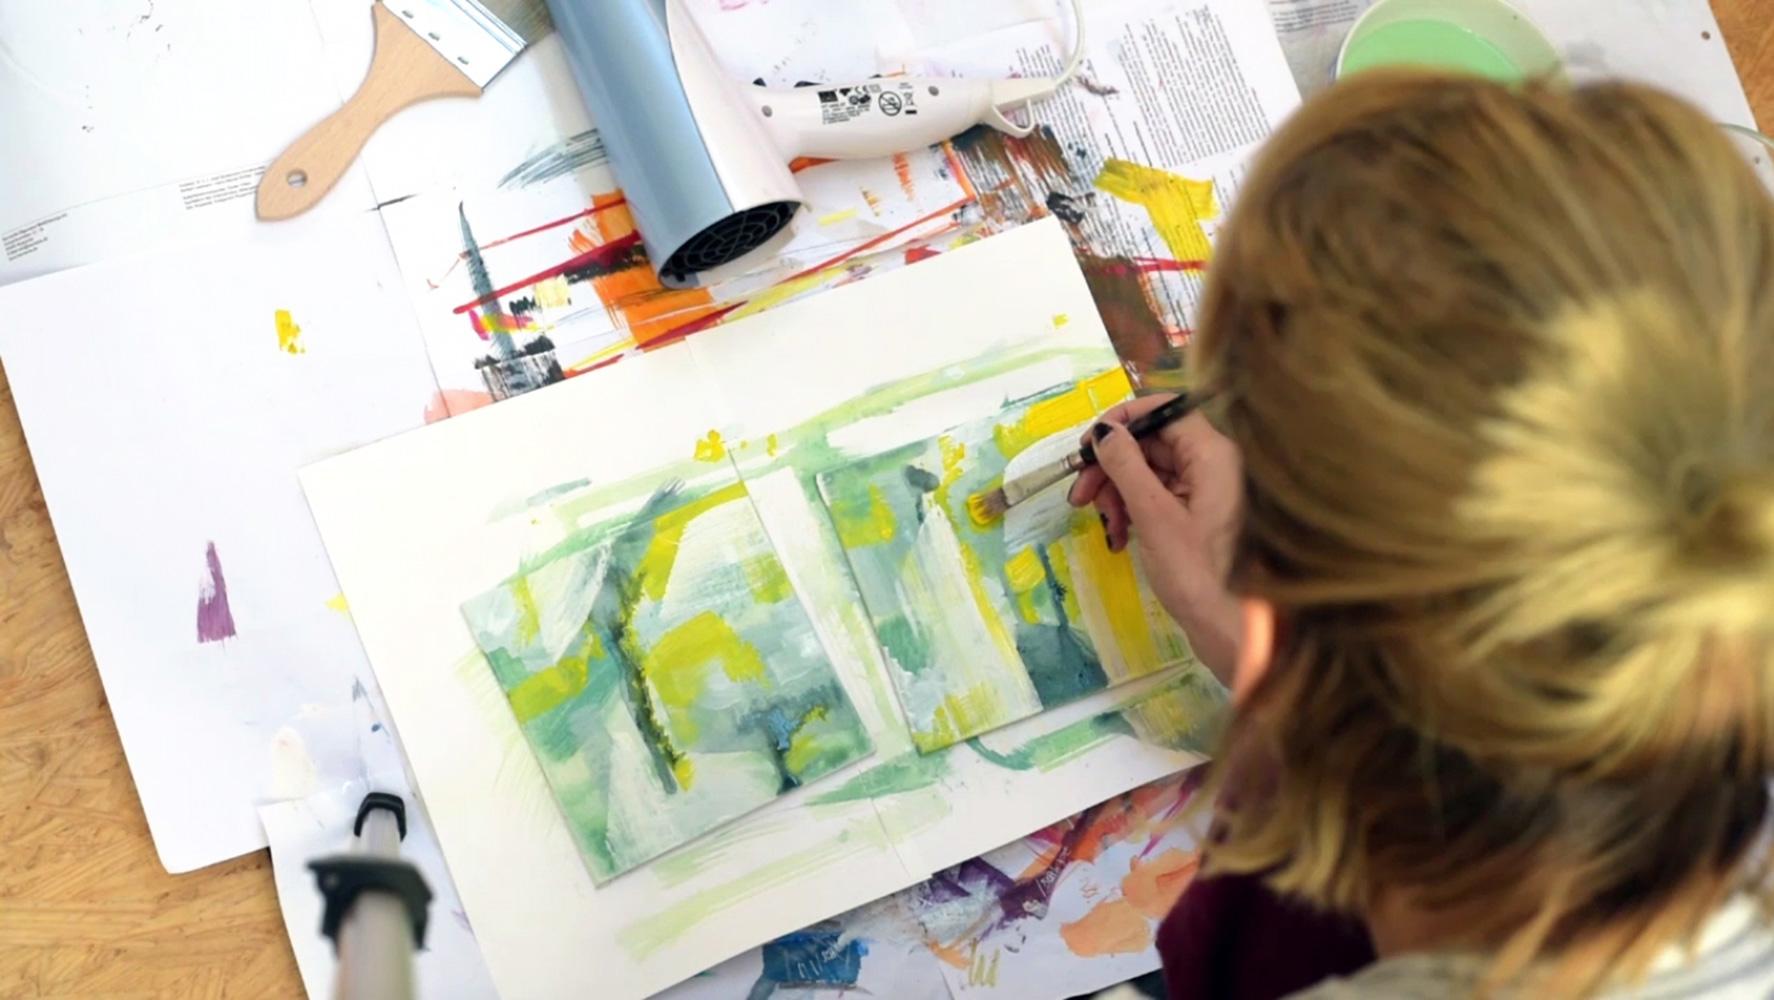 springgarden-paintingprocess-stepbystep-franziskaschwade-1